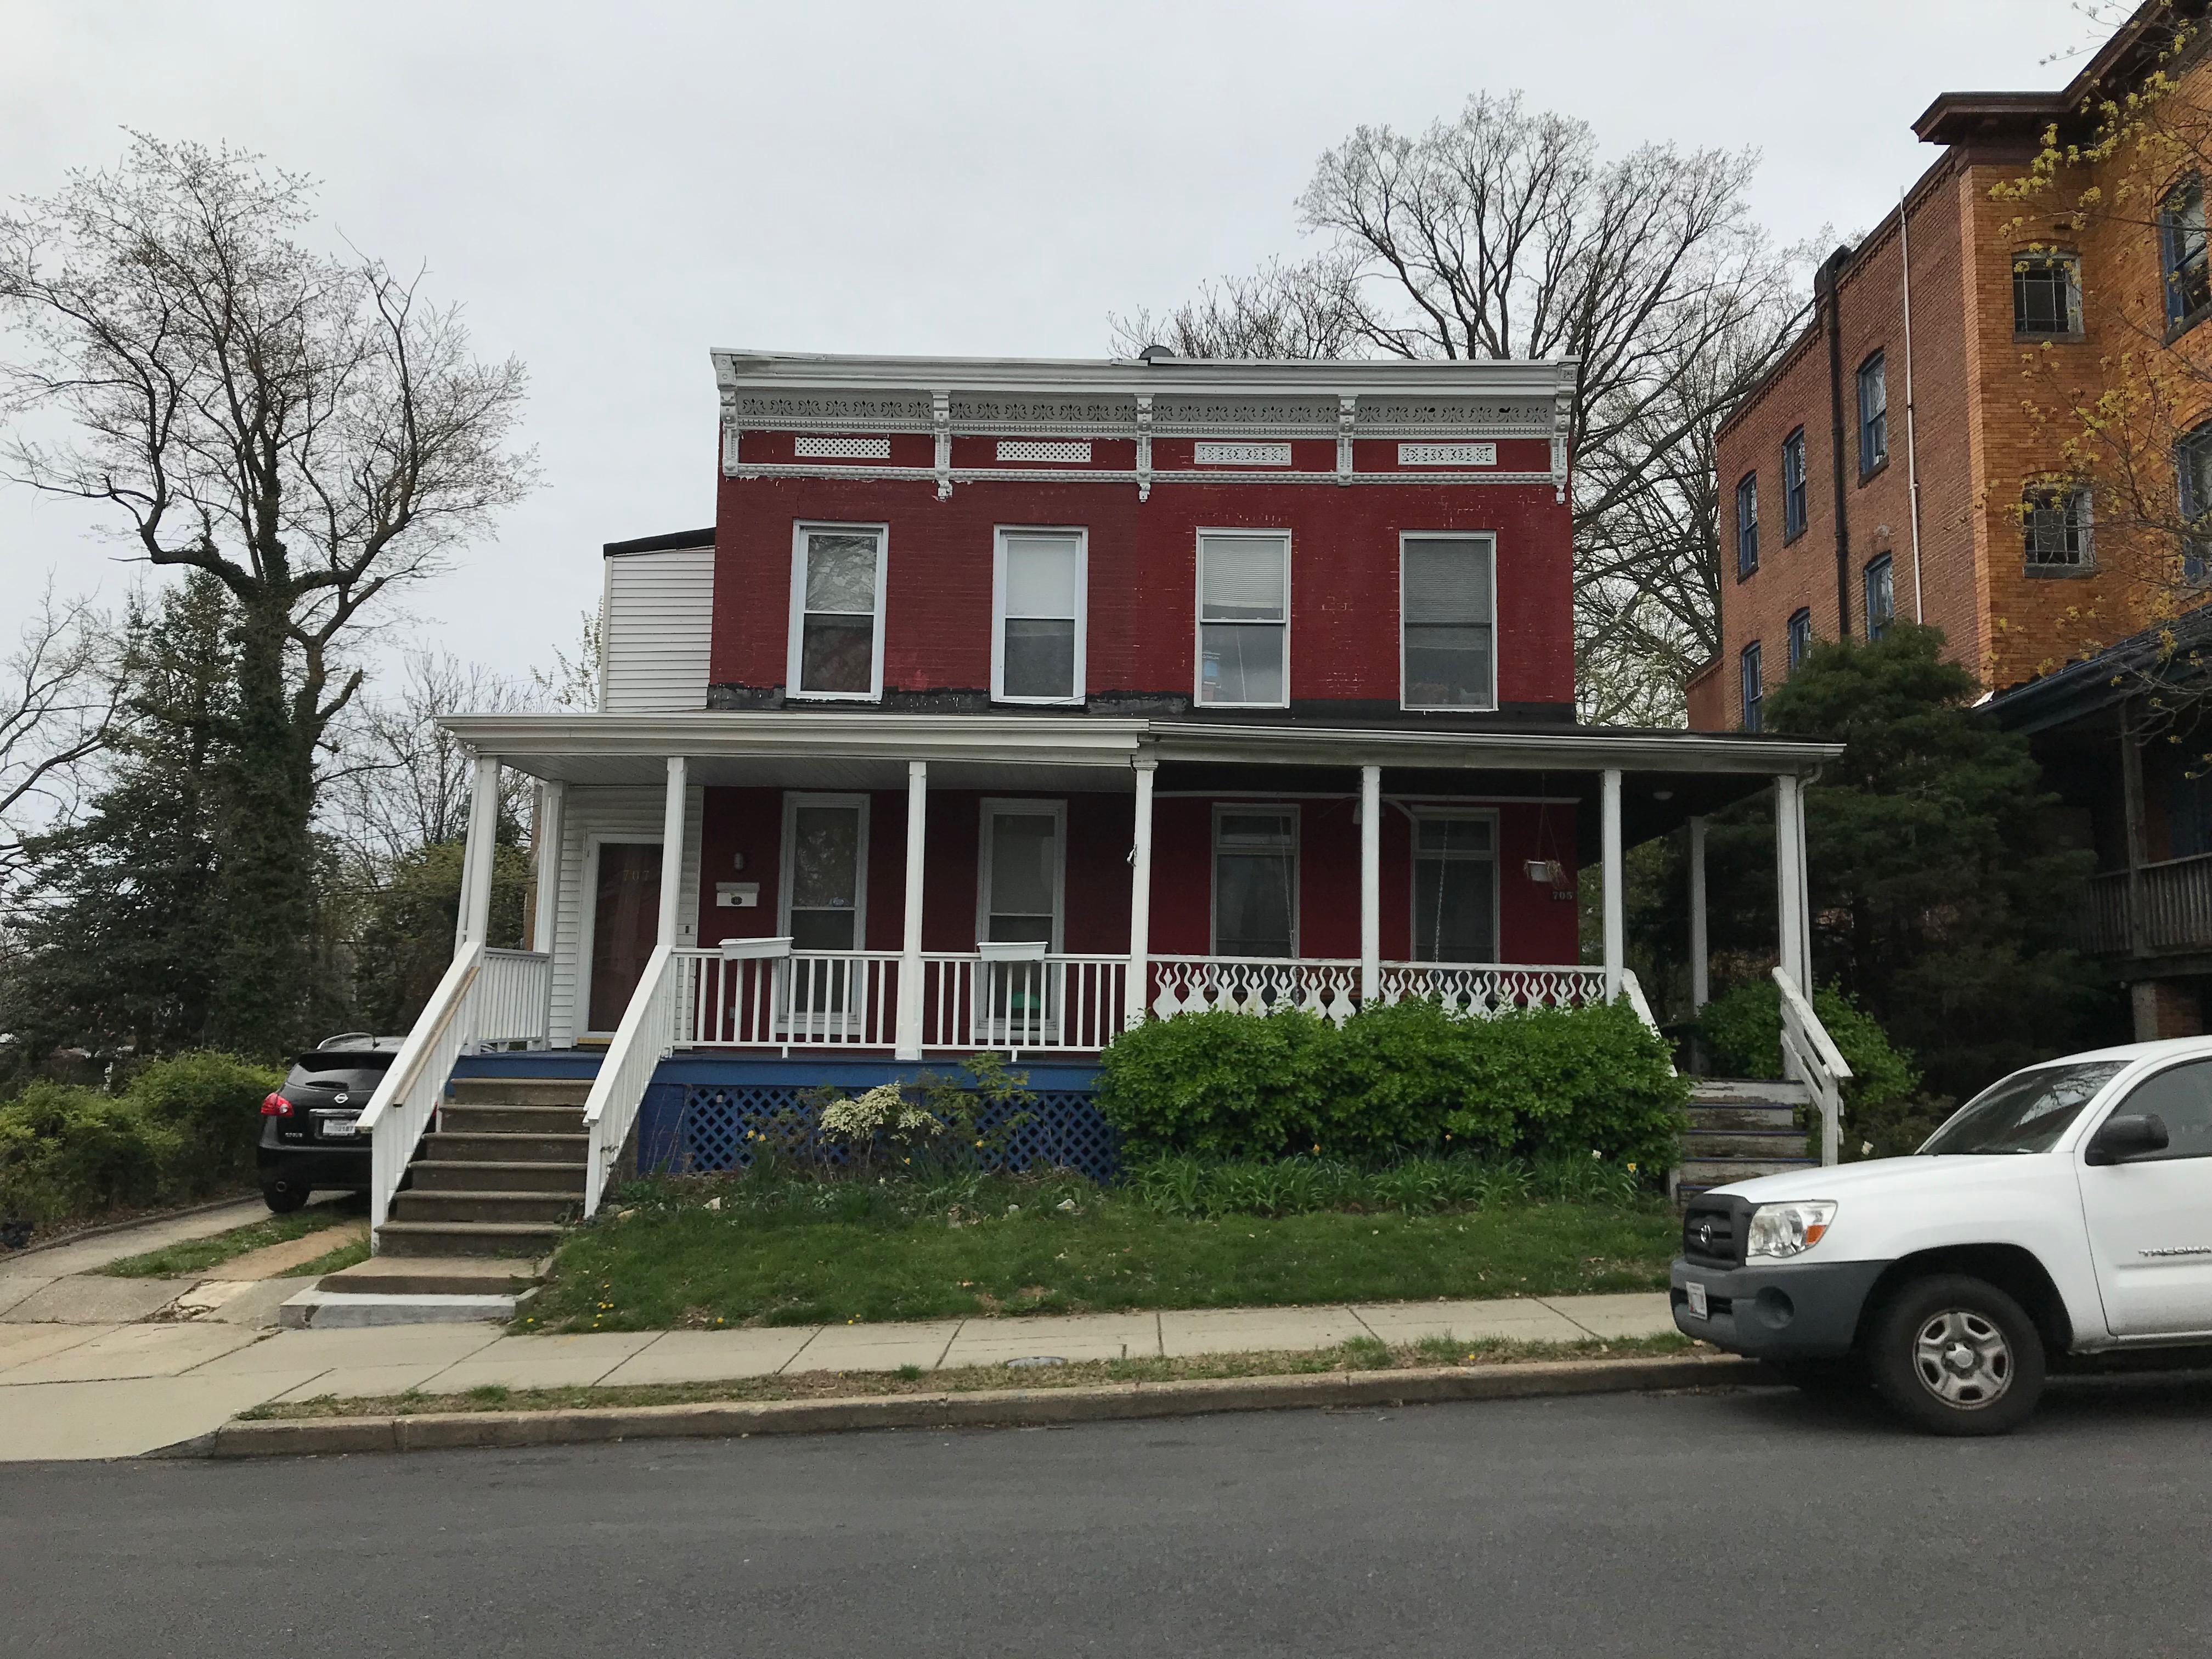 Duplex rowhouses, 705-707 gorsuch avenue, baltimore, md 21218 photo